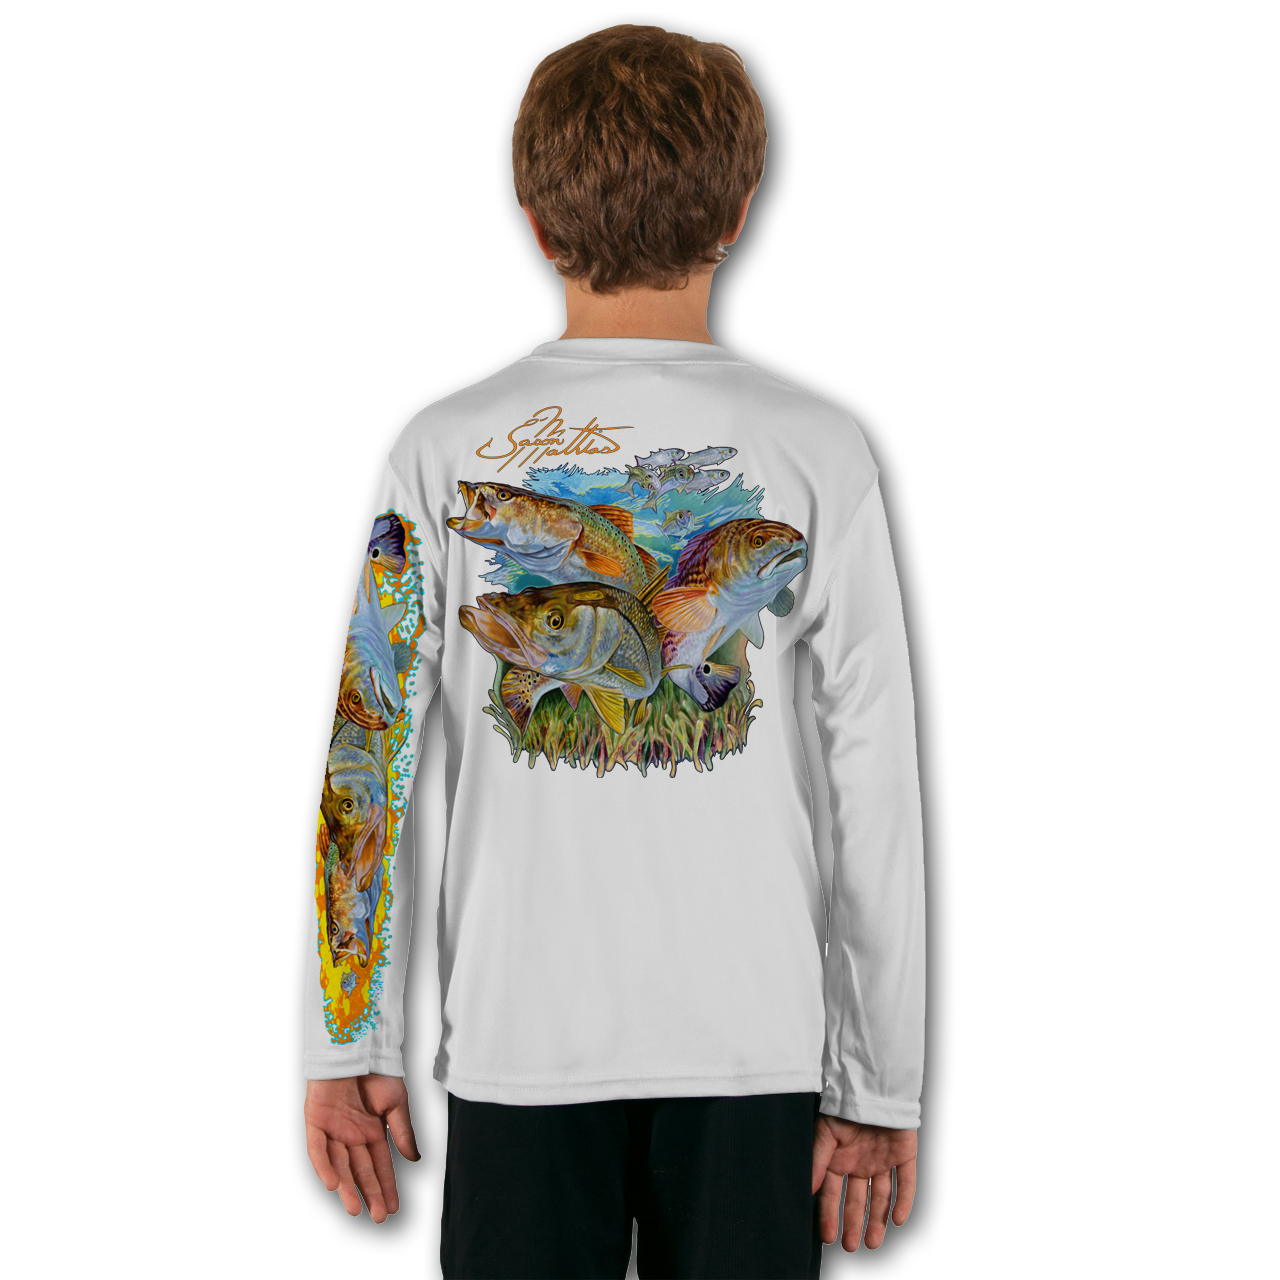 inshore-slam-white-youth-solar-ls-back-performance-shirt.png